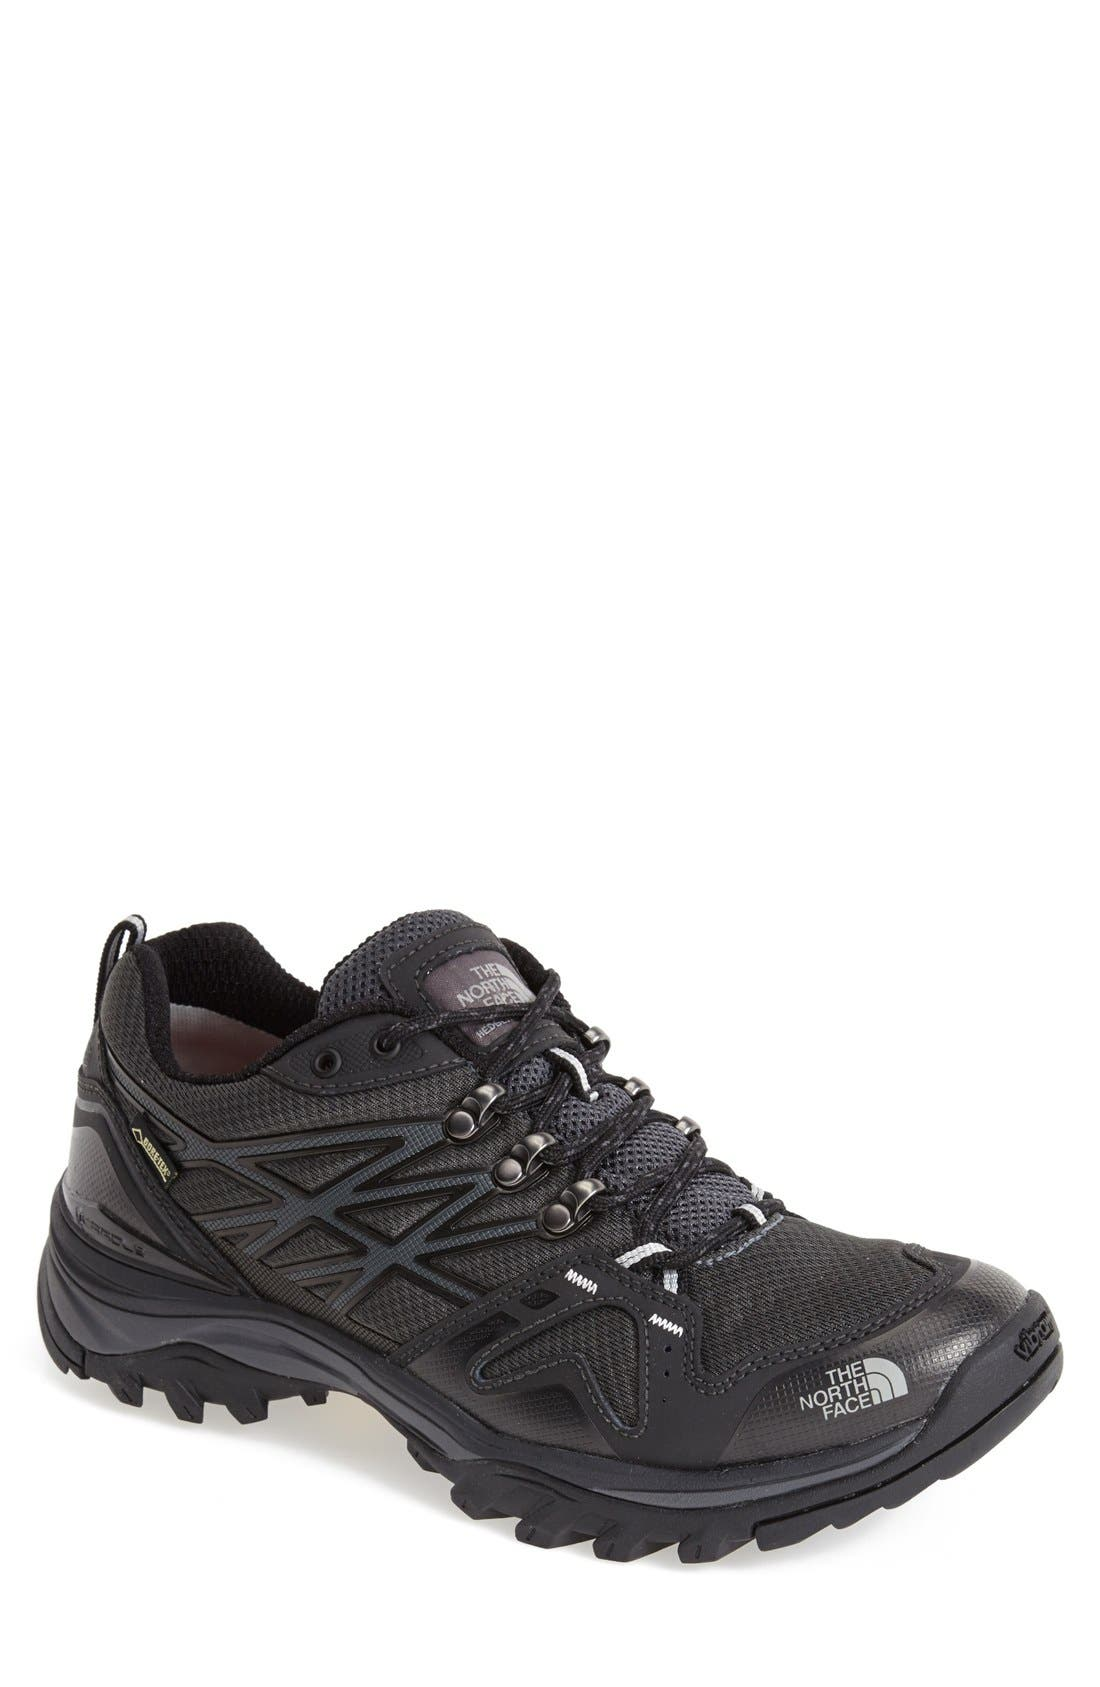 Main Image - The North Face 'Hedgehog Fastpack' Gore-Tex® Waterproof Hiking Shoe (Men)